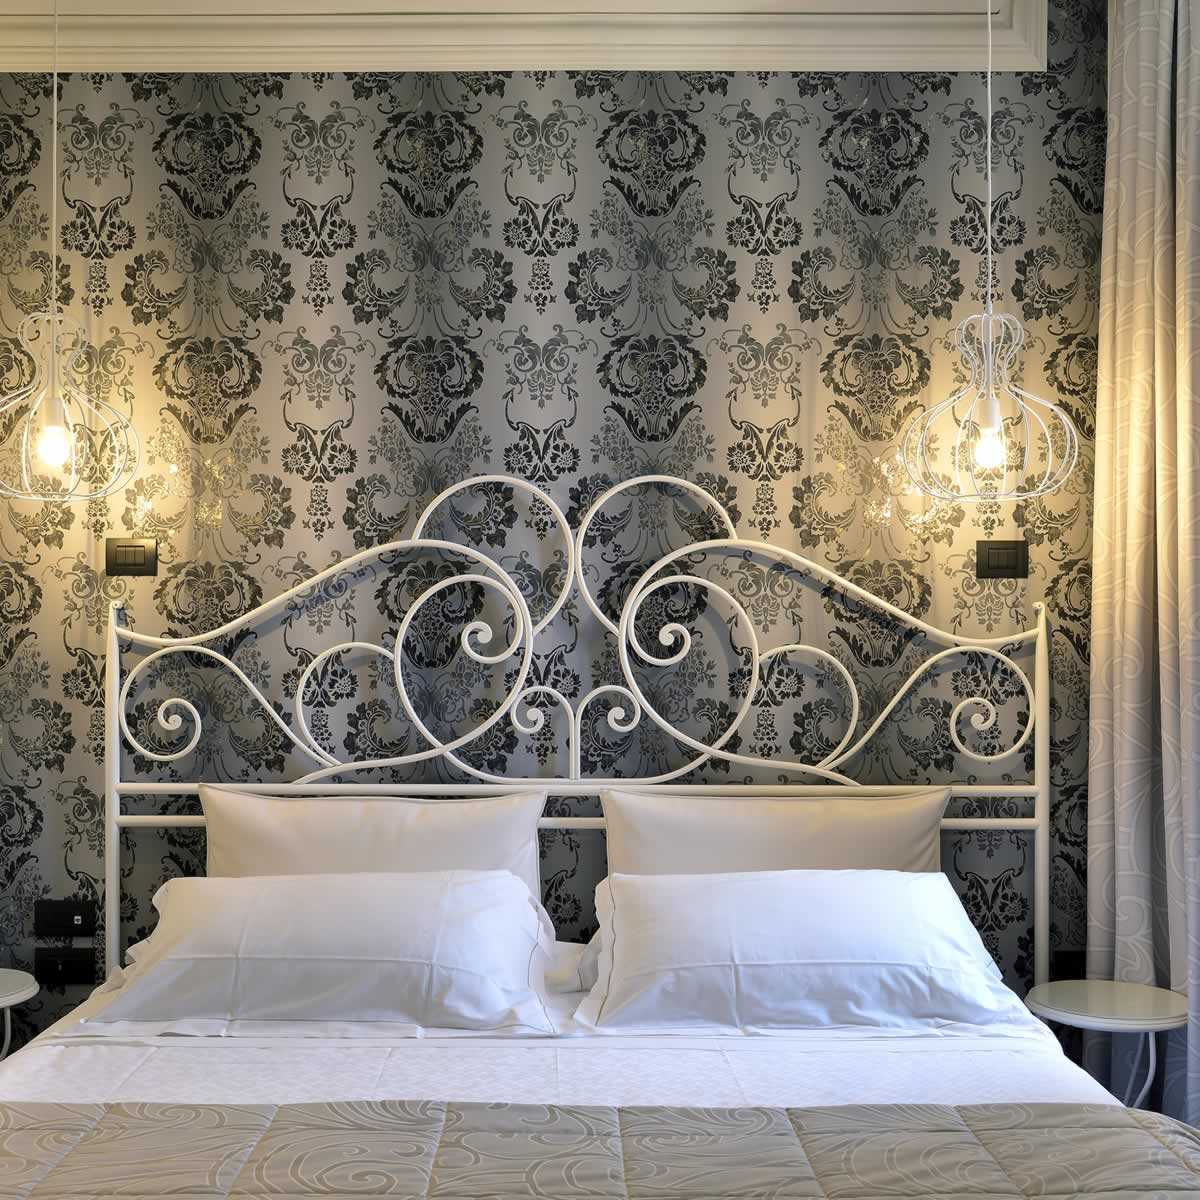 Letto Matrimoniale A Bologna.The Rooms